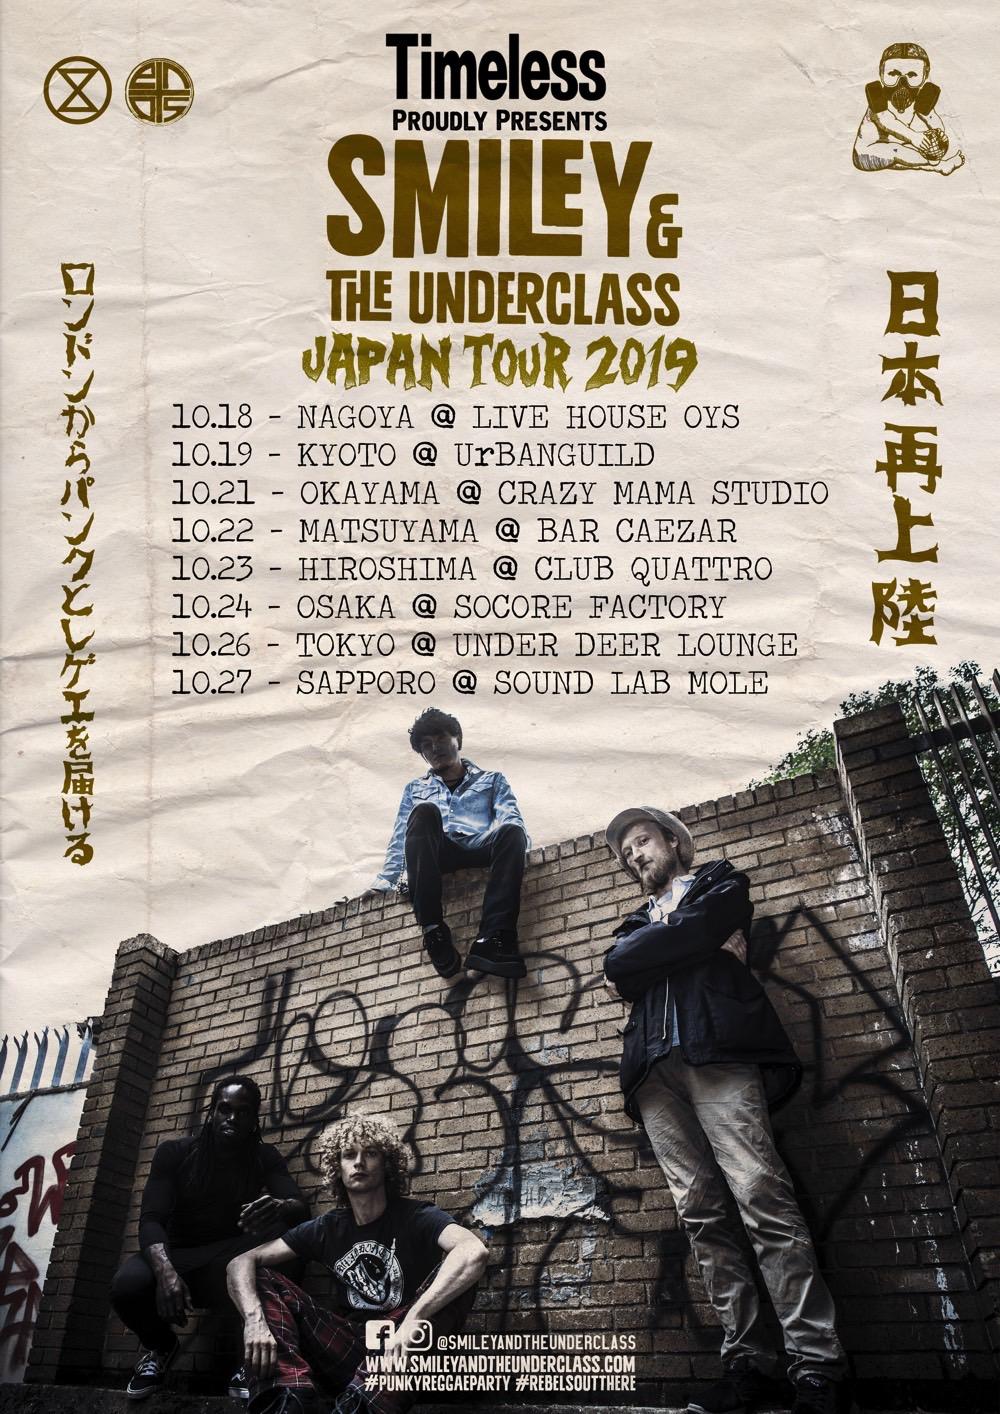 Smiley & The Underclass Japan Tour 2019 imaga